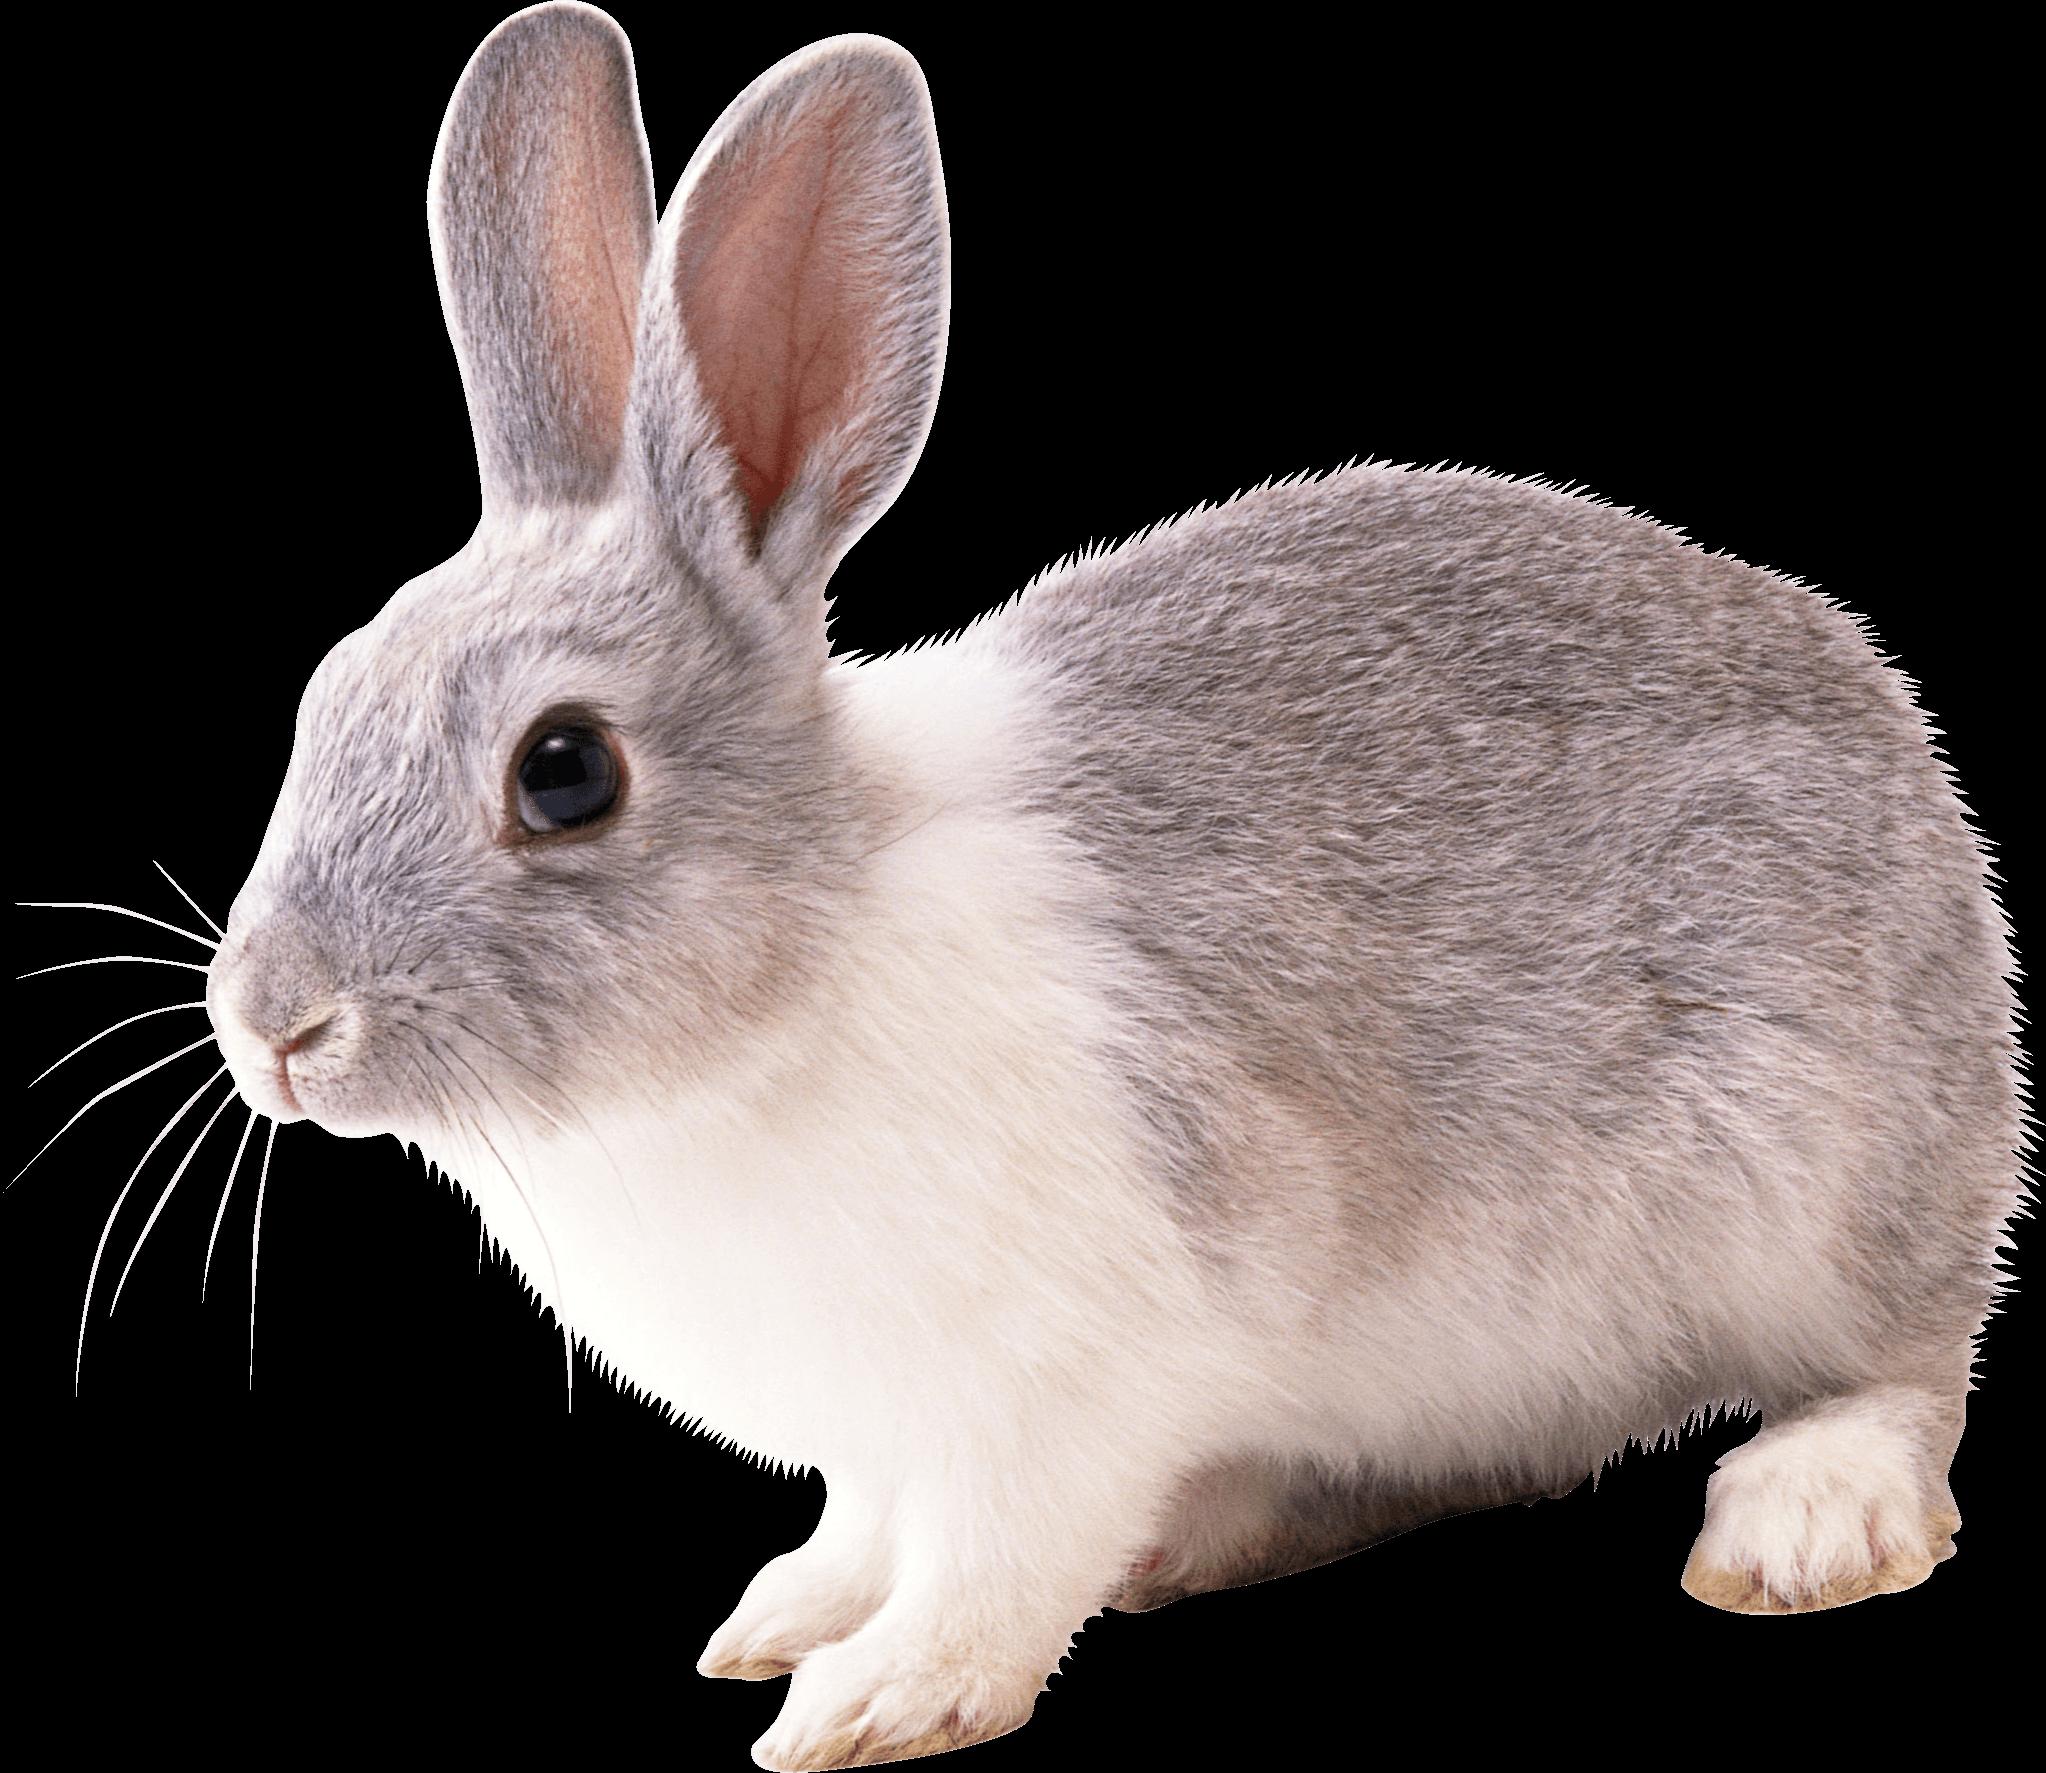 Rabbit Png Image PNG Image - Rabbit HD PNG